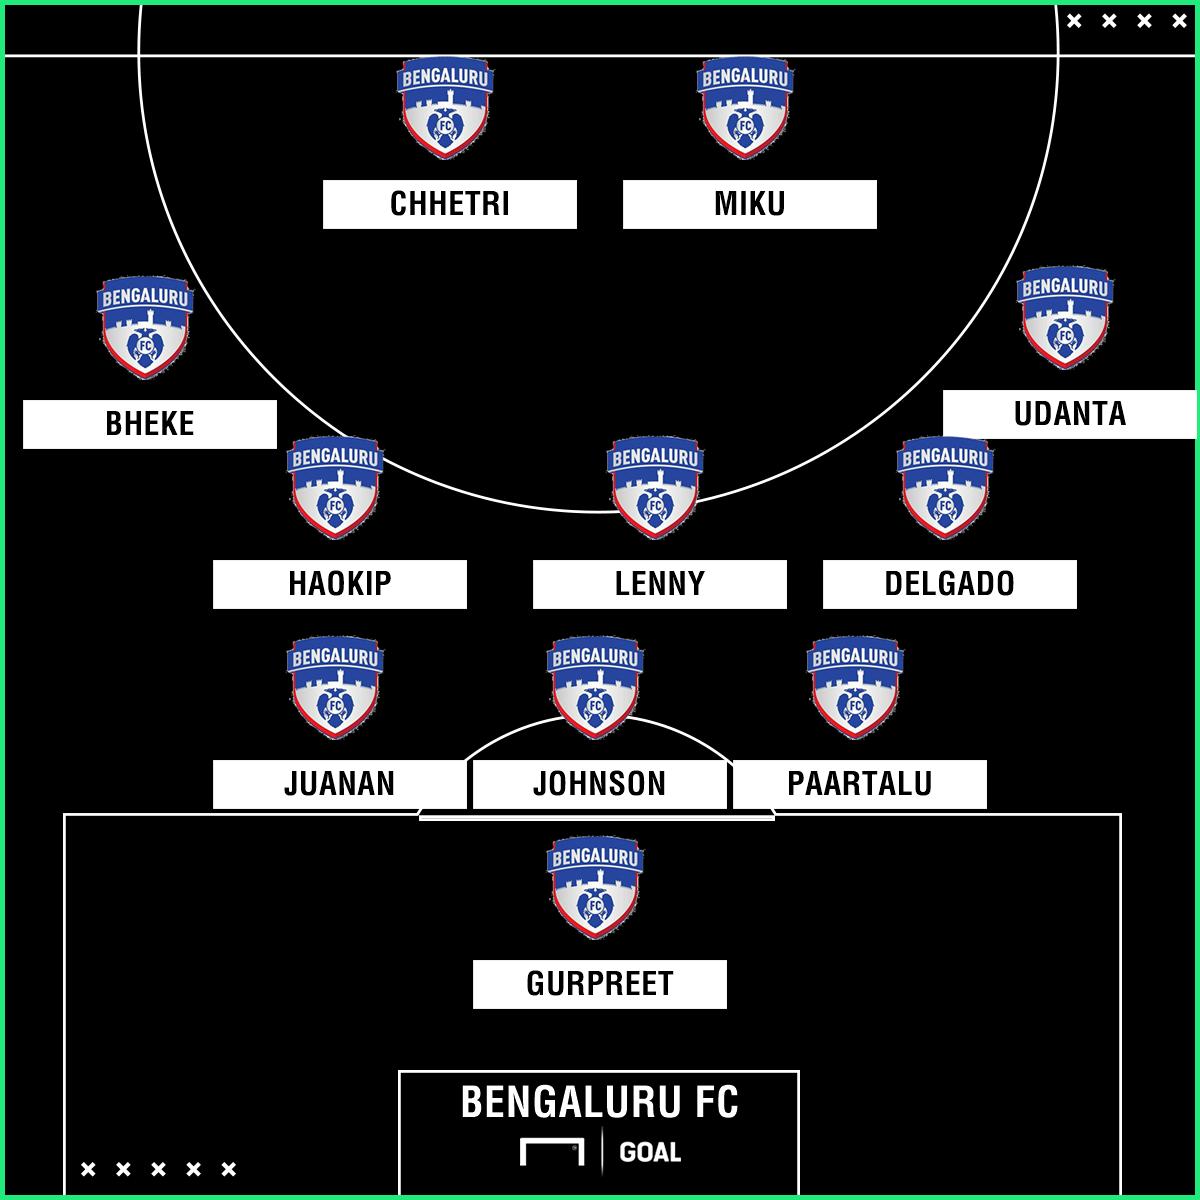 Bengaluru FC formation 2